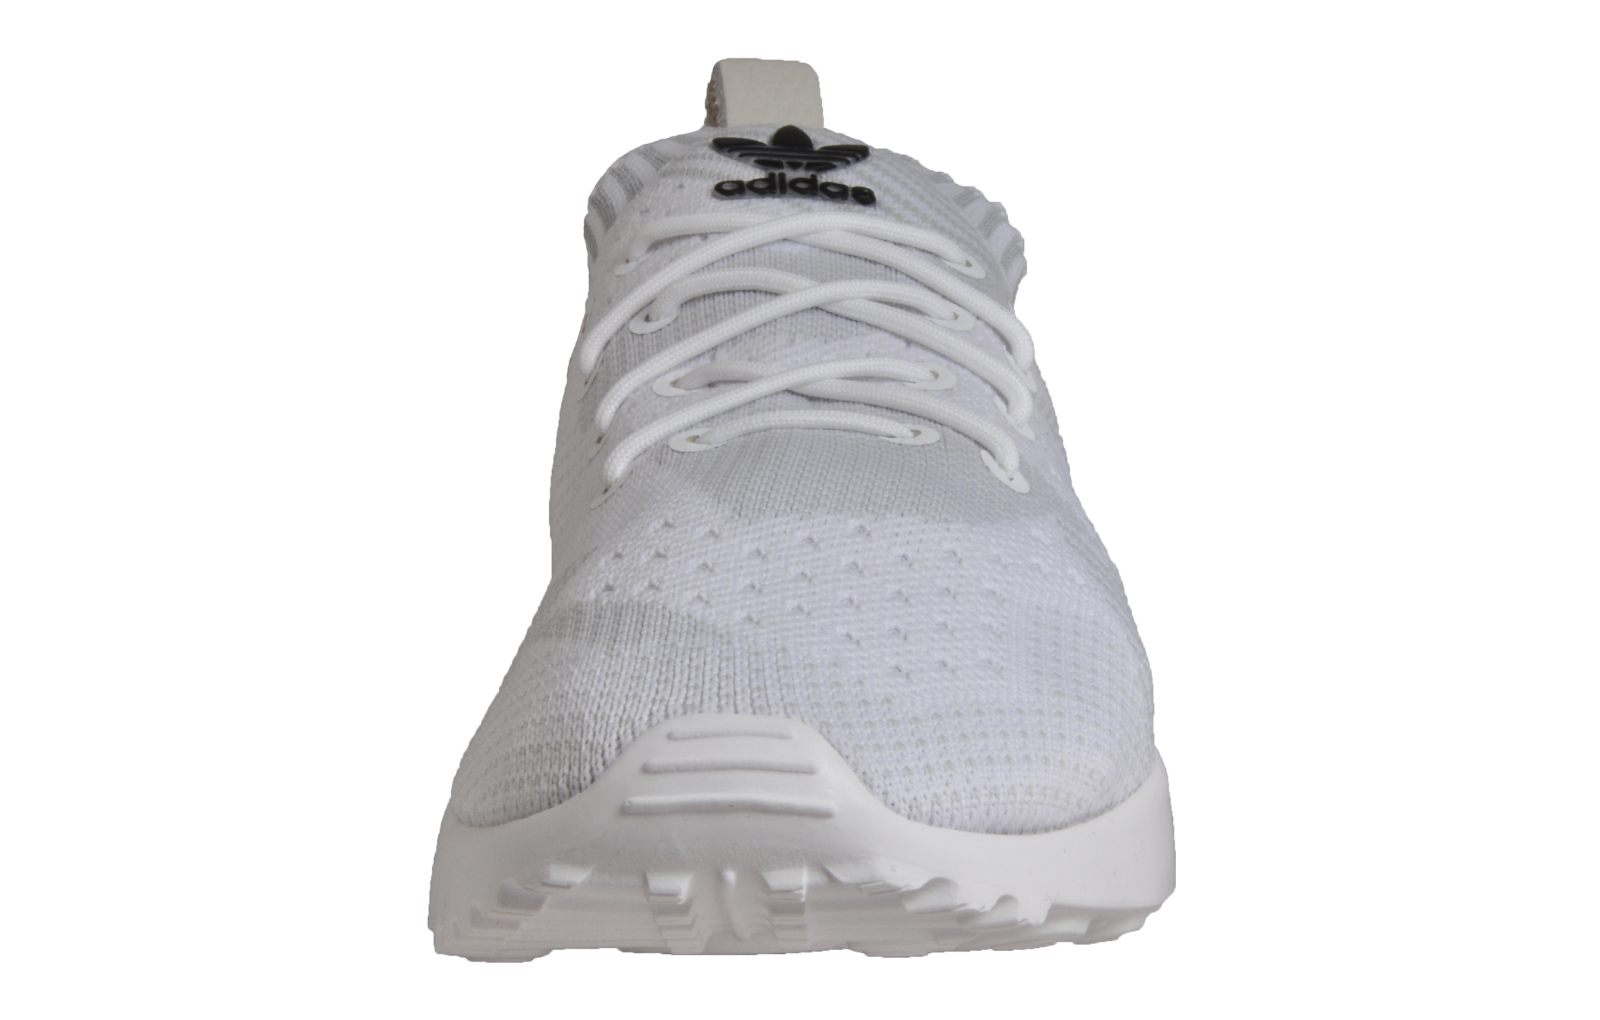 0a19bf0cc5d22 Adidas Originals ZX Flux ADV Virtue PK Primeknit Women s Fitness Trainers  White